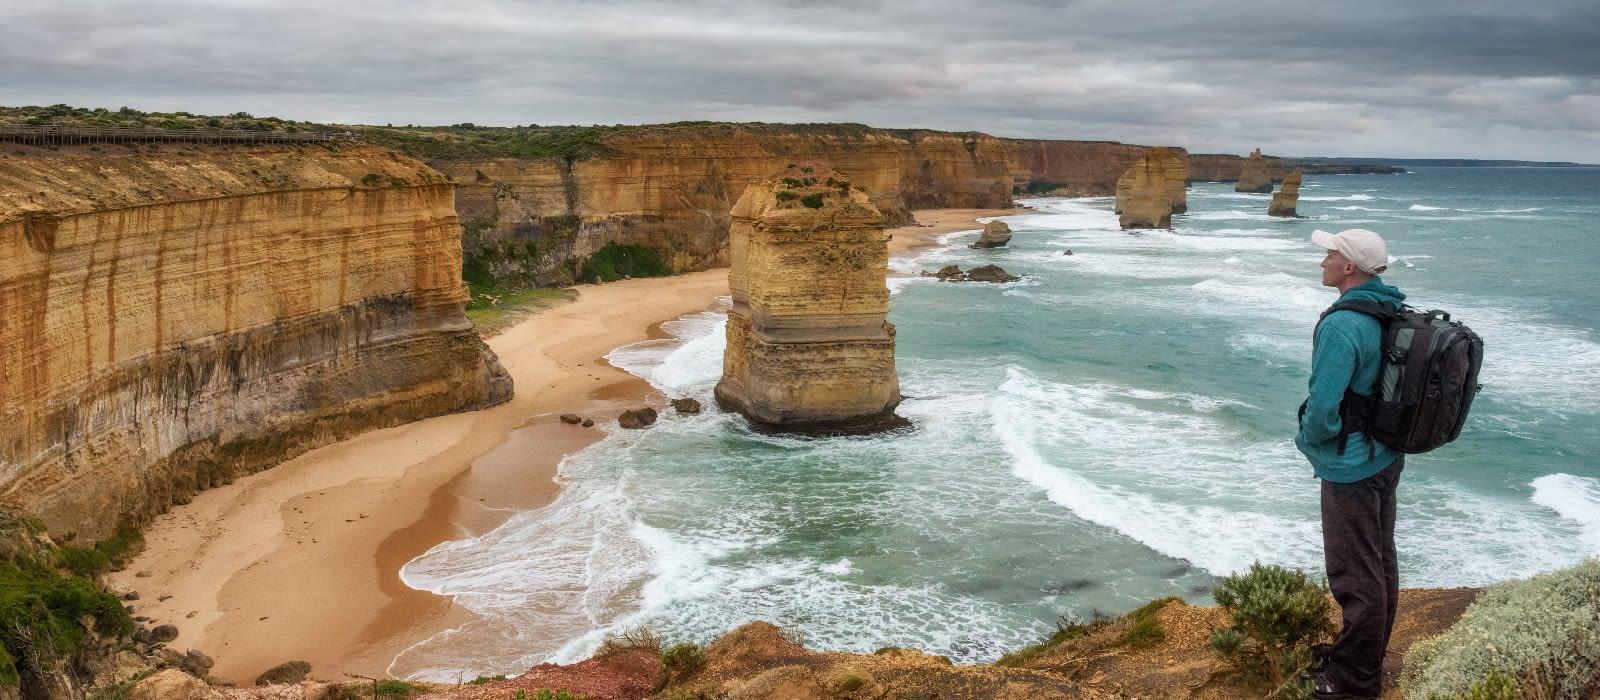 things to do in Australia - The Twelve Apostles